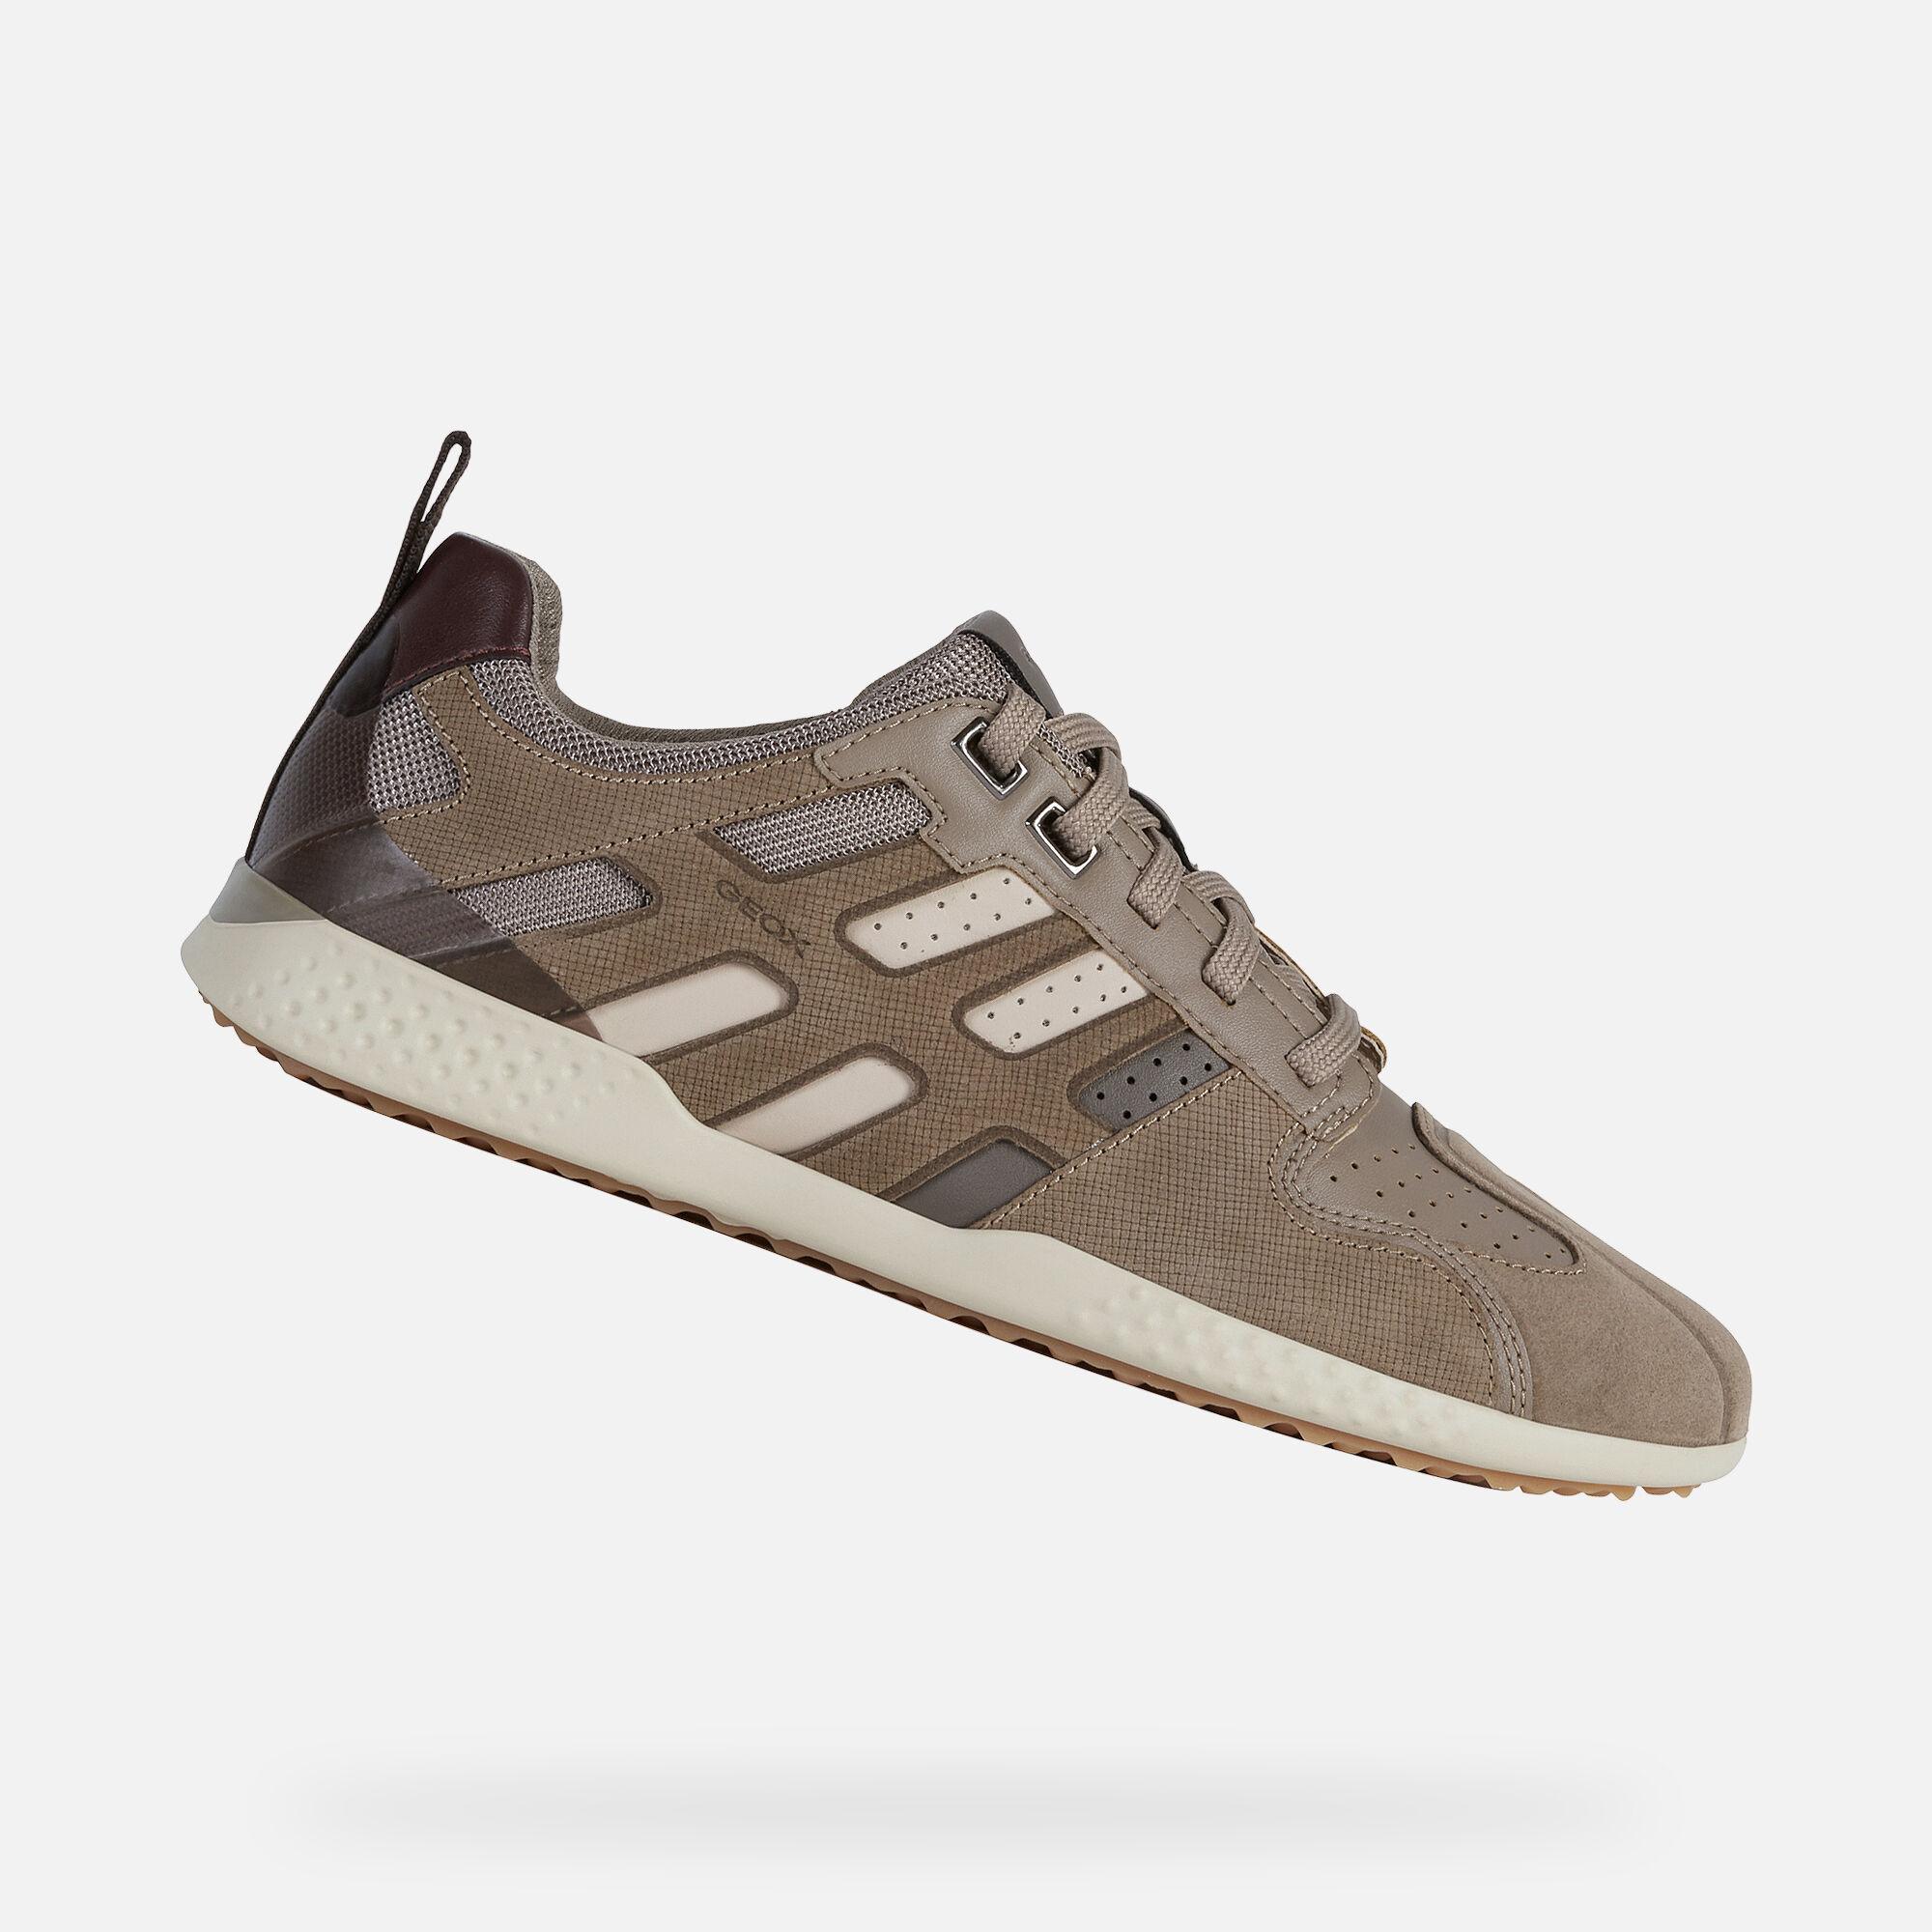 Geox SNAKE.2 Man: Sand Sneakers   FW20